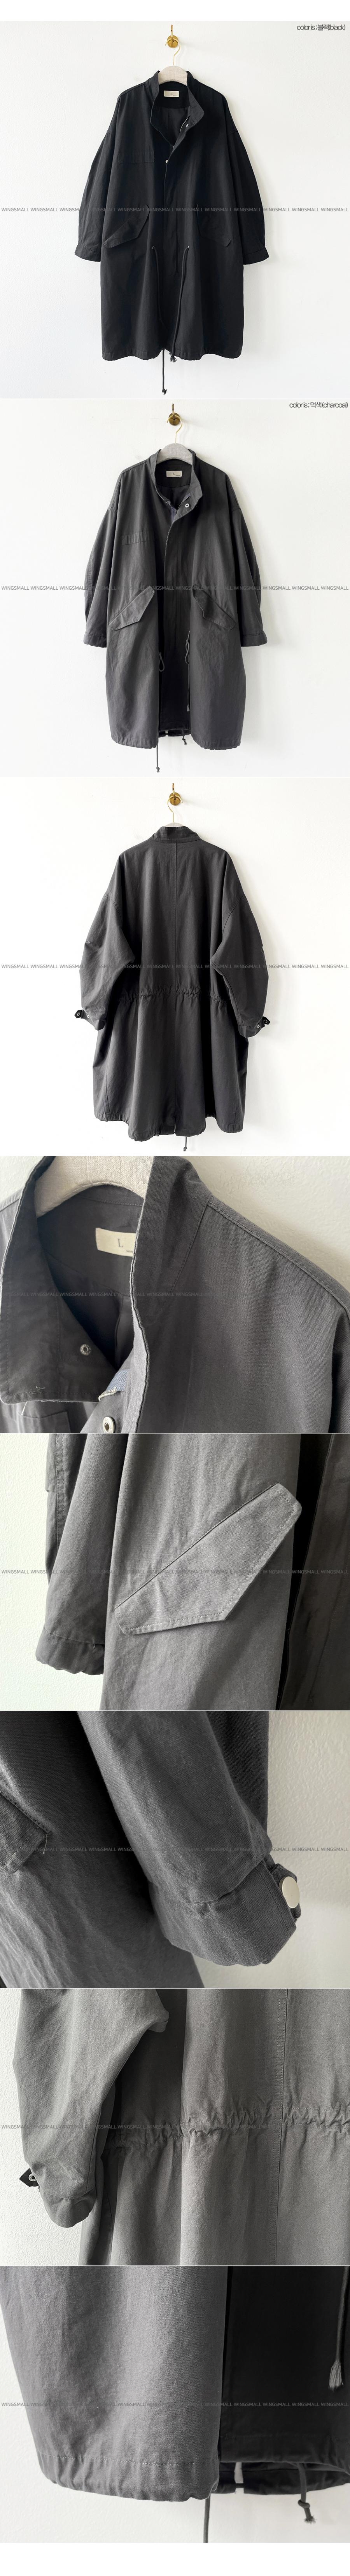 accessories grey color image-S4L1